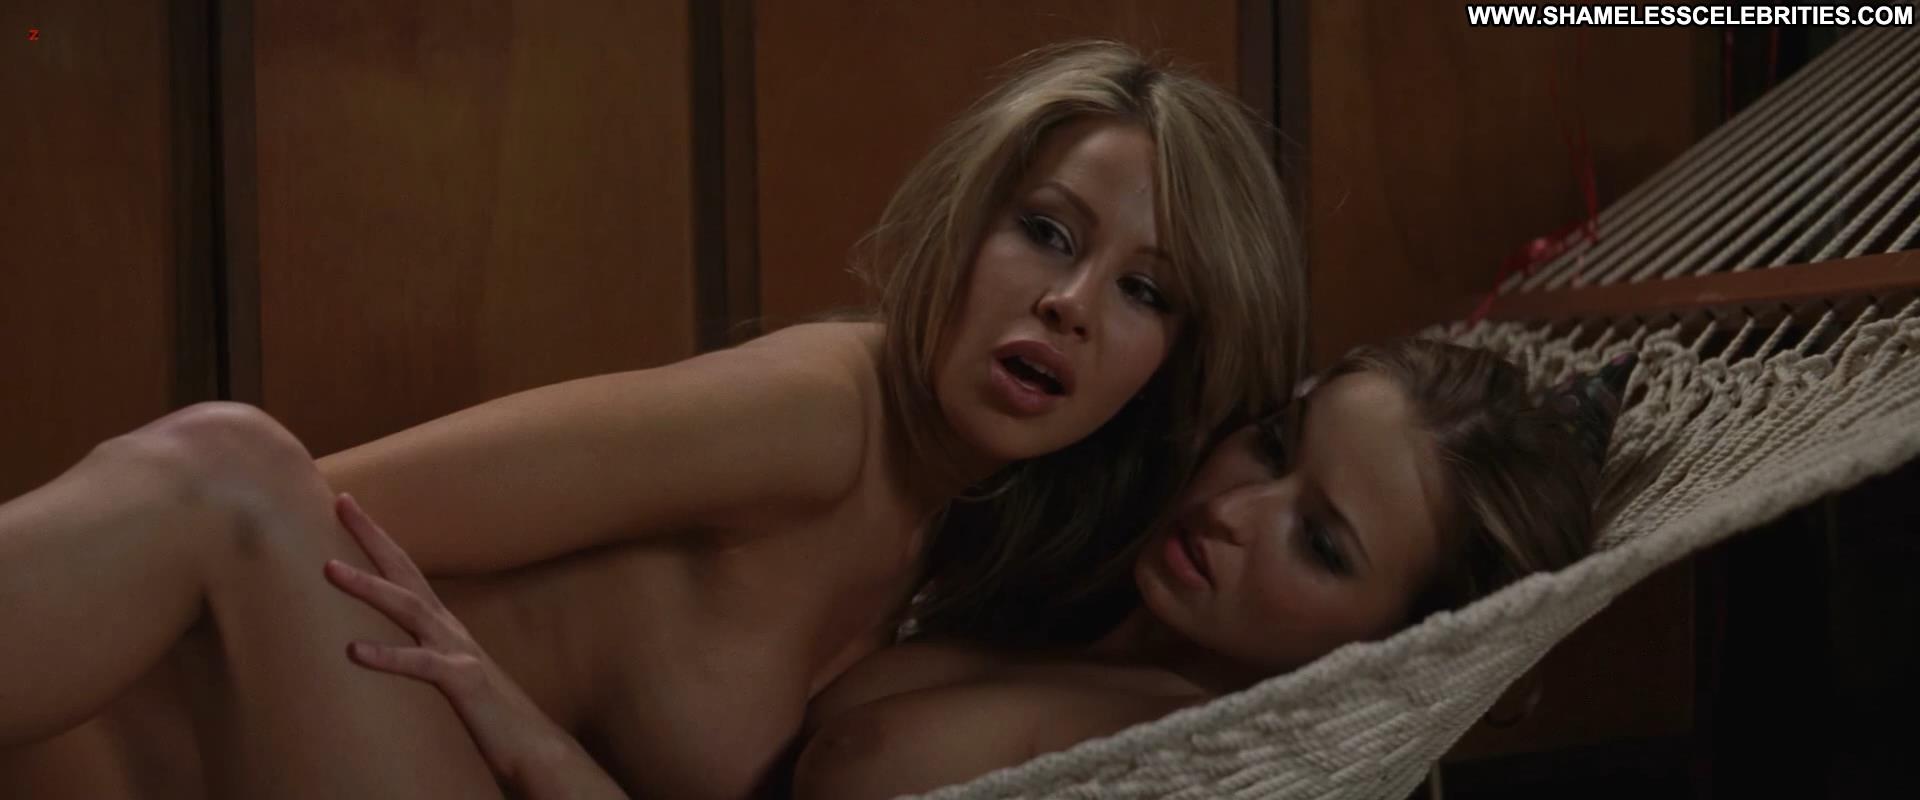 Naked sex Hottest girl